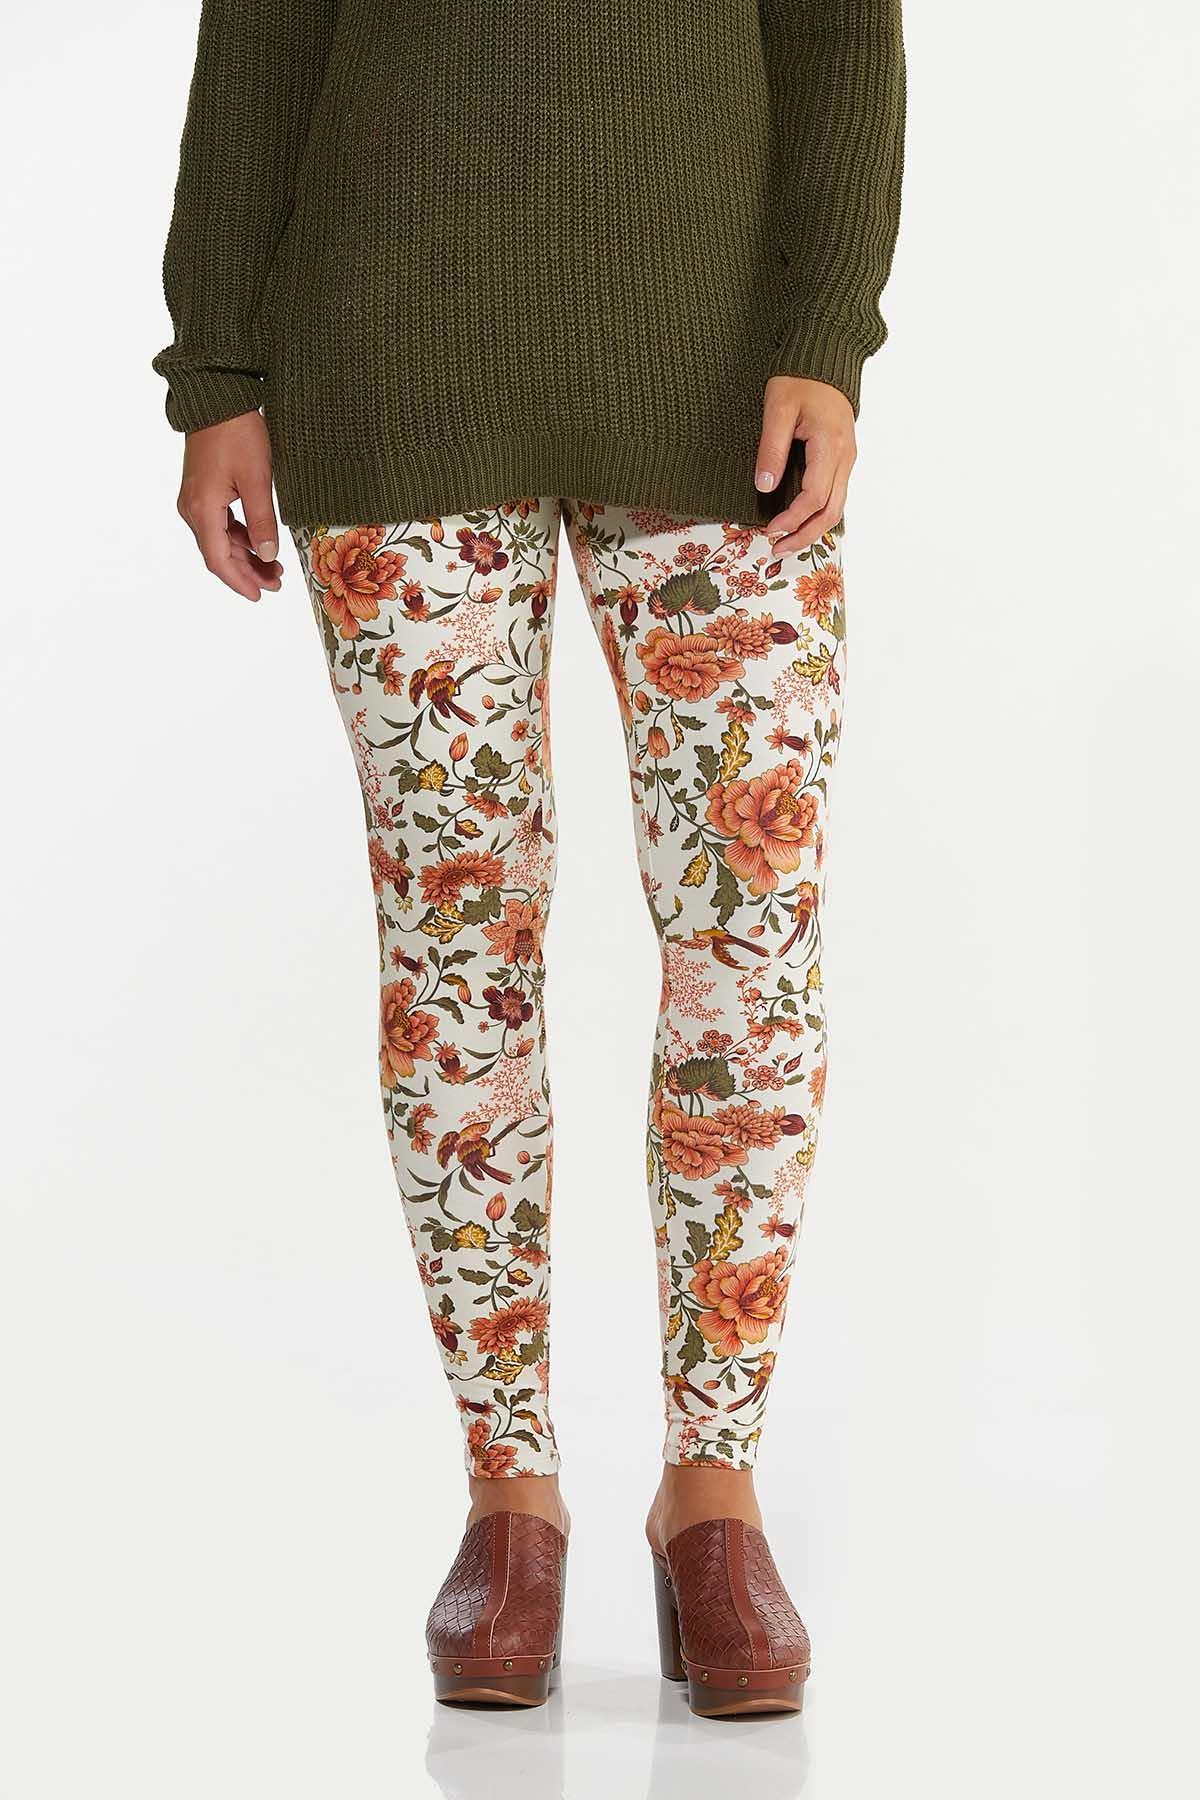 Spice Floral Leggings